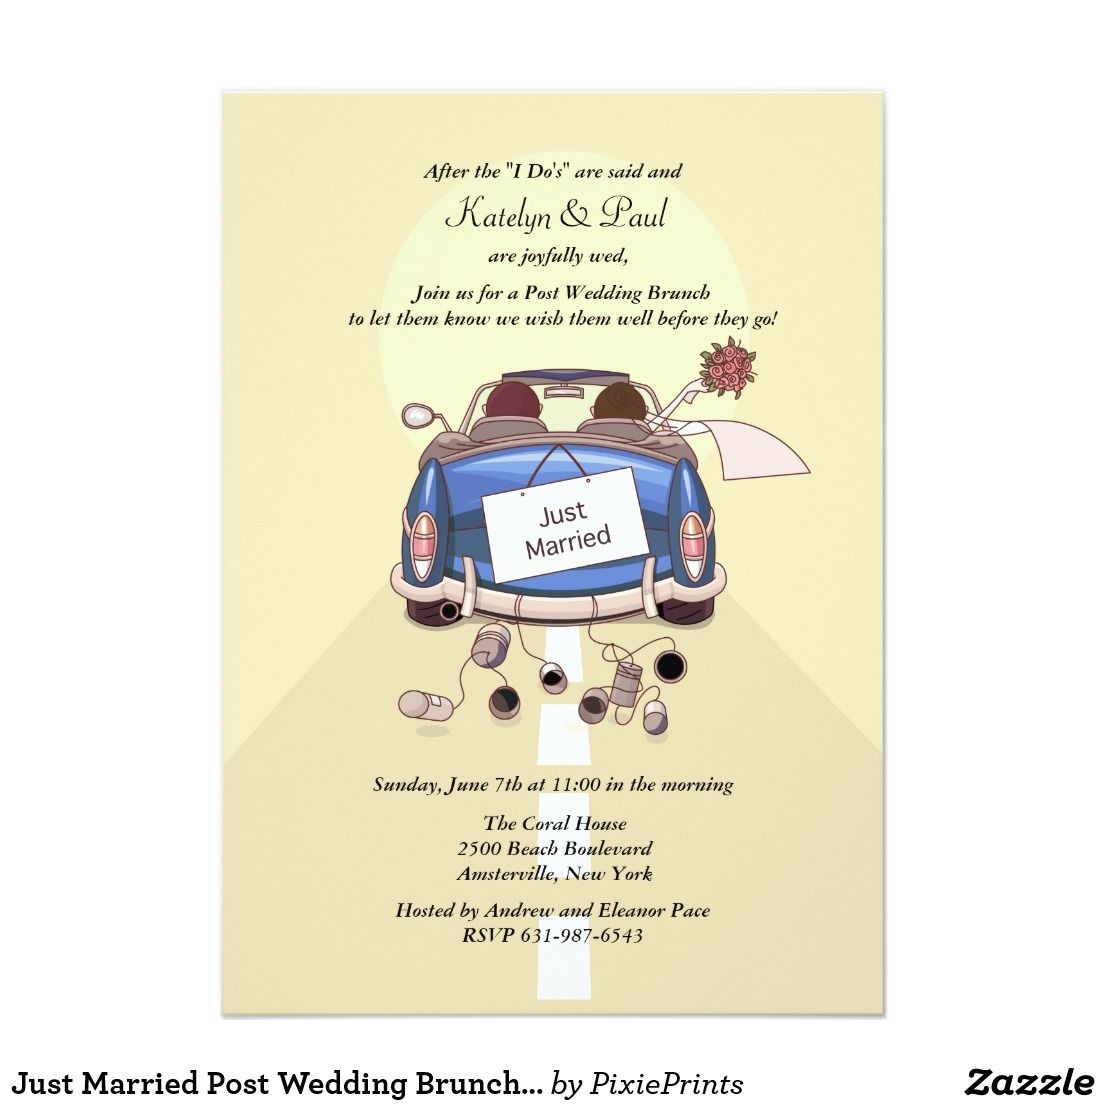 Just Married Post Wedding Brunch Invitation Yell Brunch